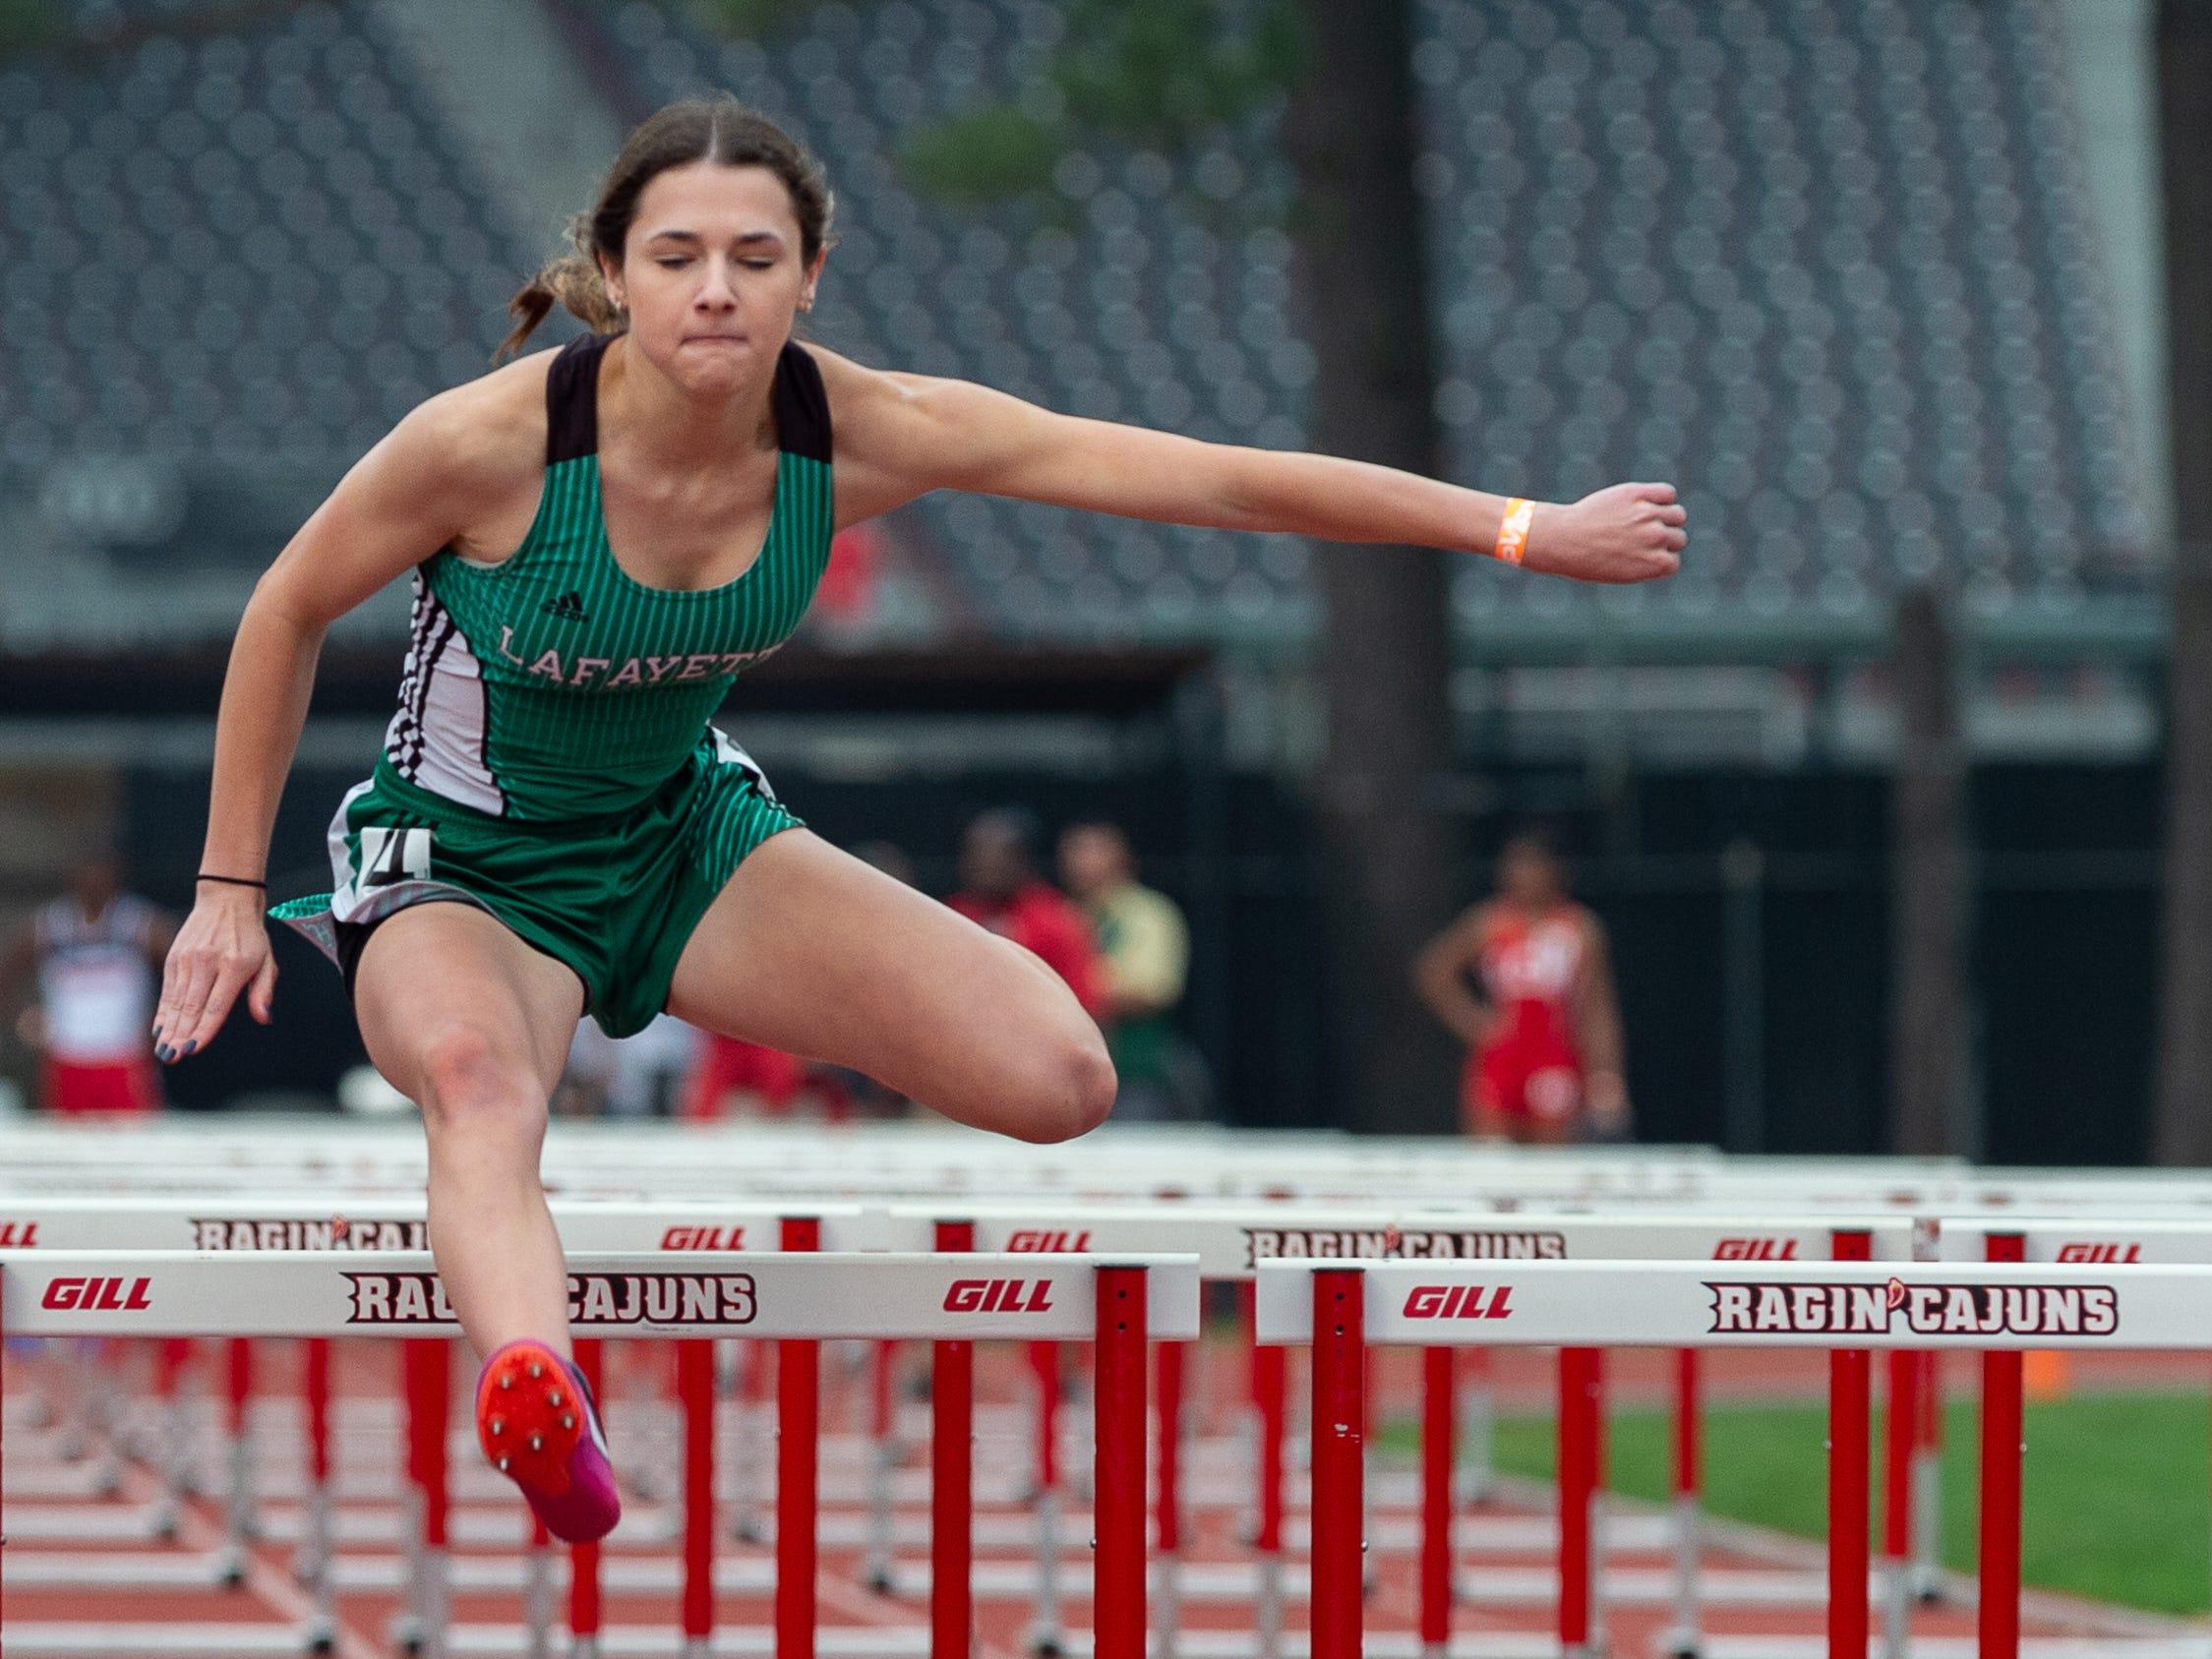 Gabrielle Gary wins the 100m hurdles at The 2019 Beaver Club Relays. Friday, April 5, 2019.